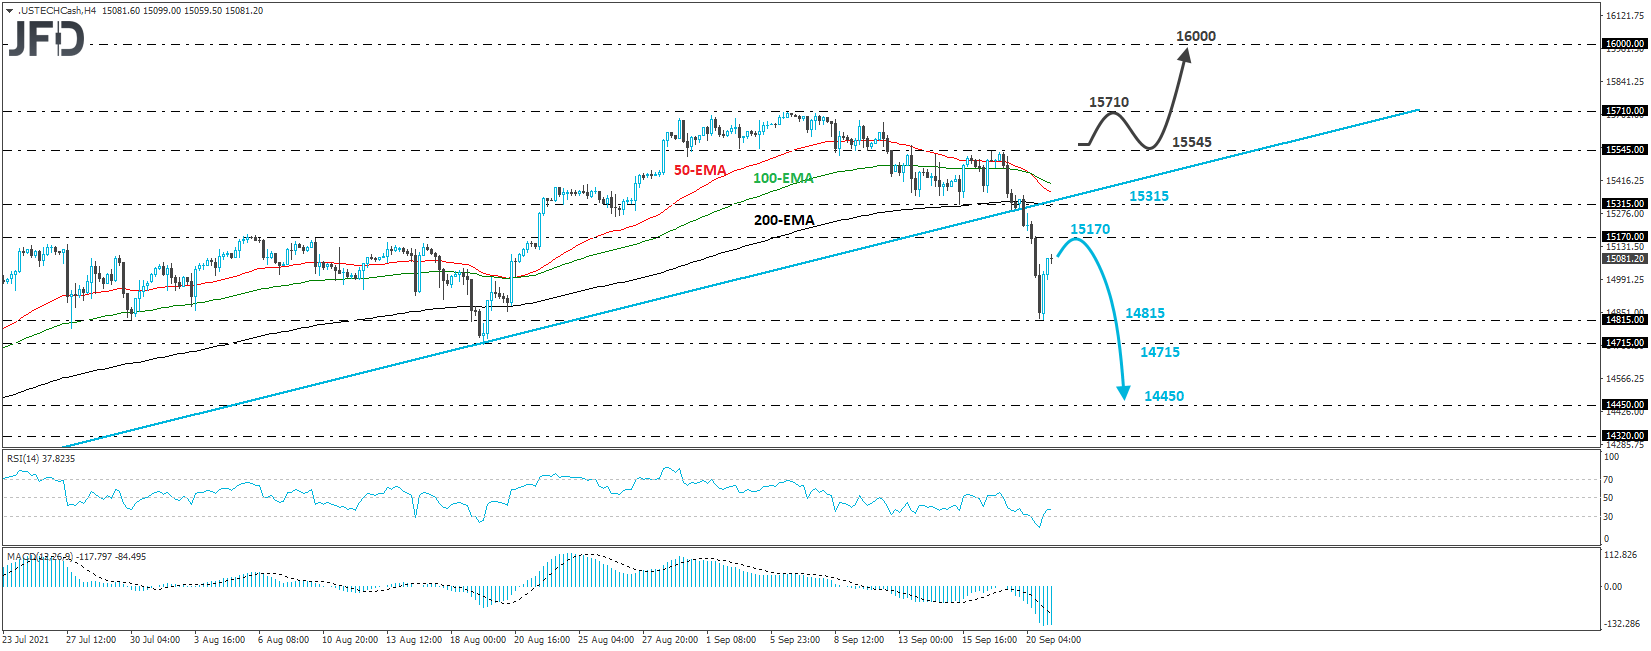 Nasdaq 100 cash index 4-hour chart technical analysis